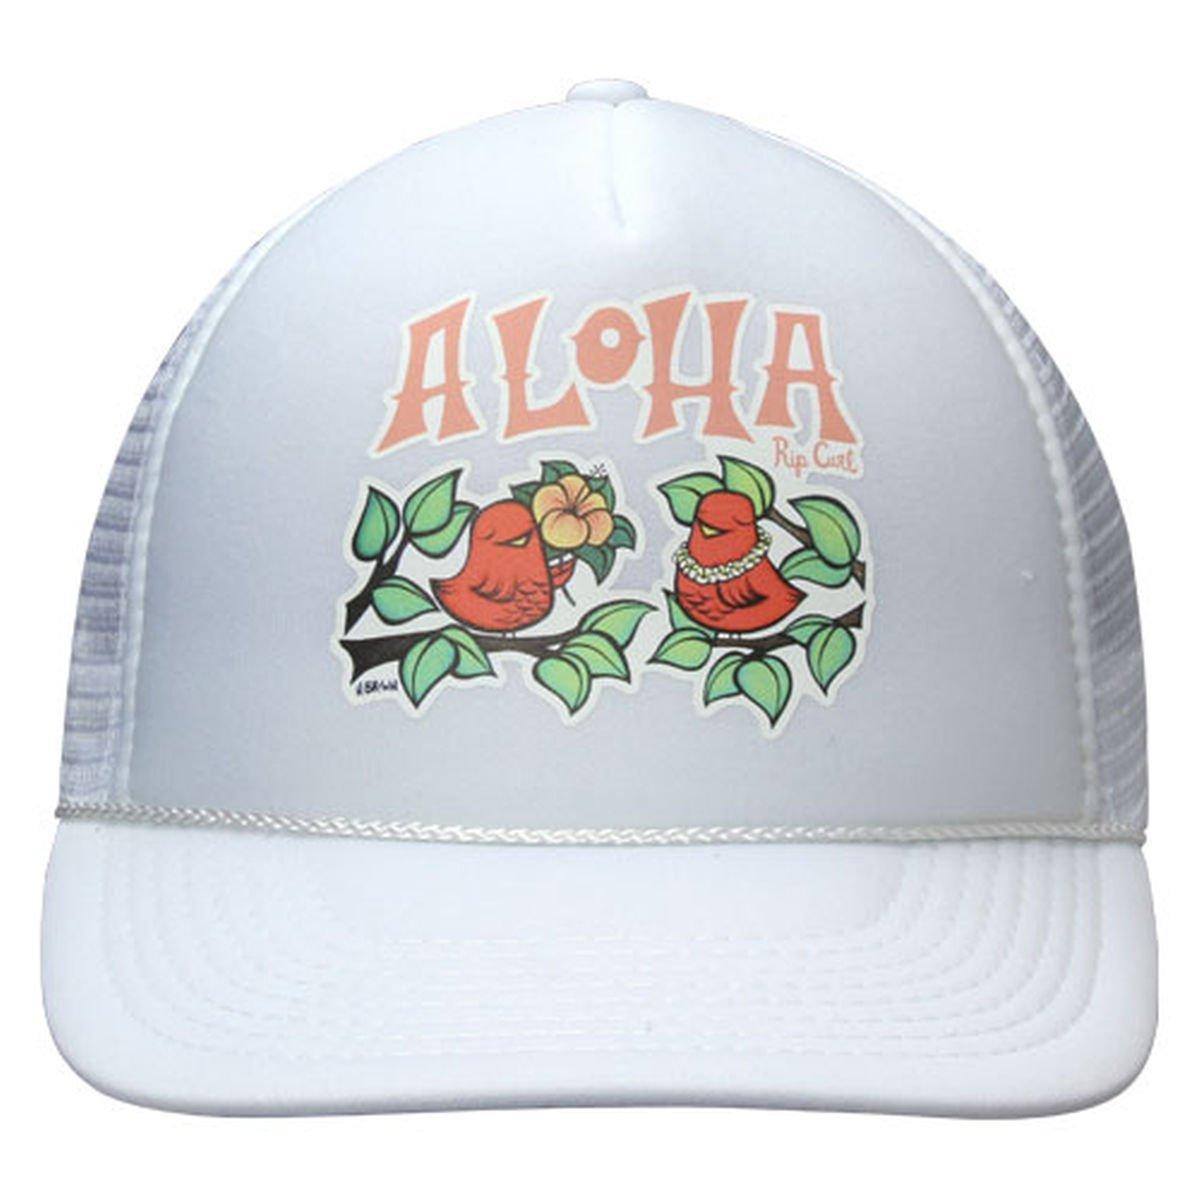 15457252c Rip Curl Womens Beach Chicks Aloha Trucker Hat Cap - White at Amazon ...